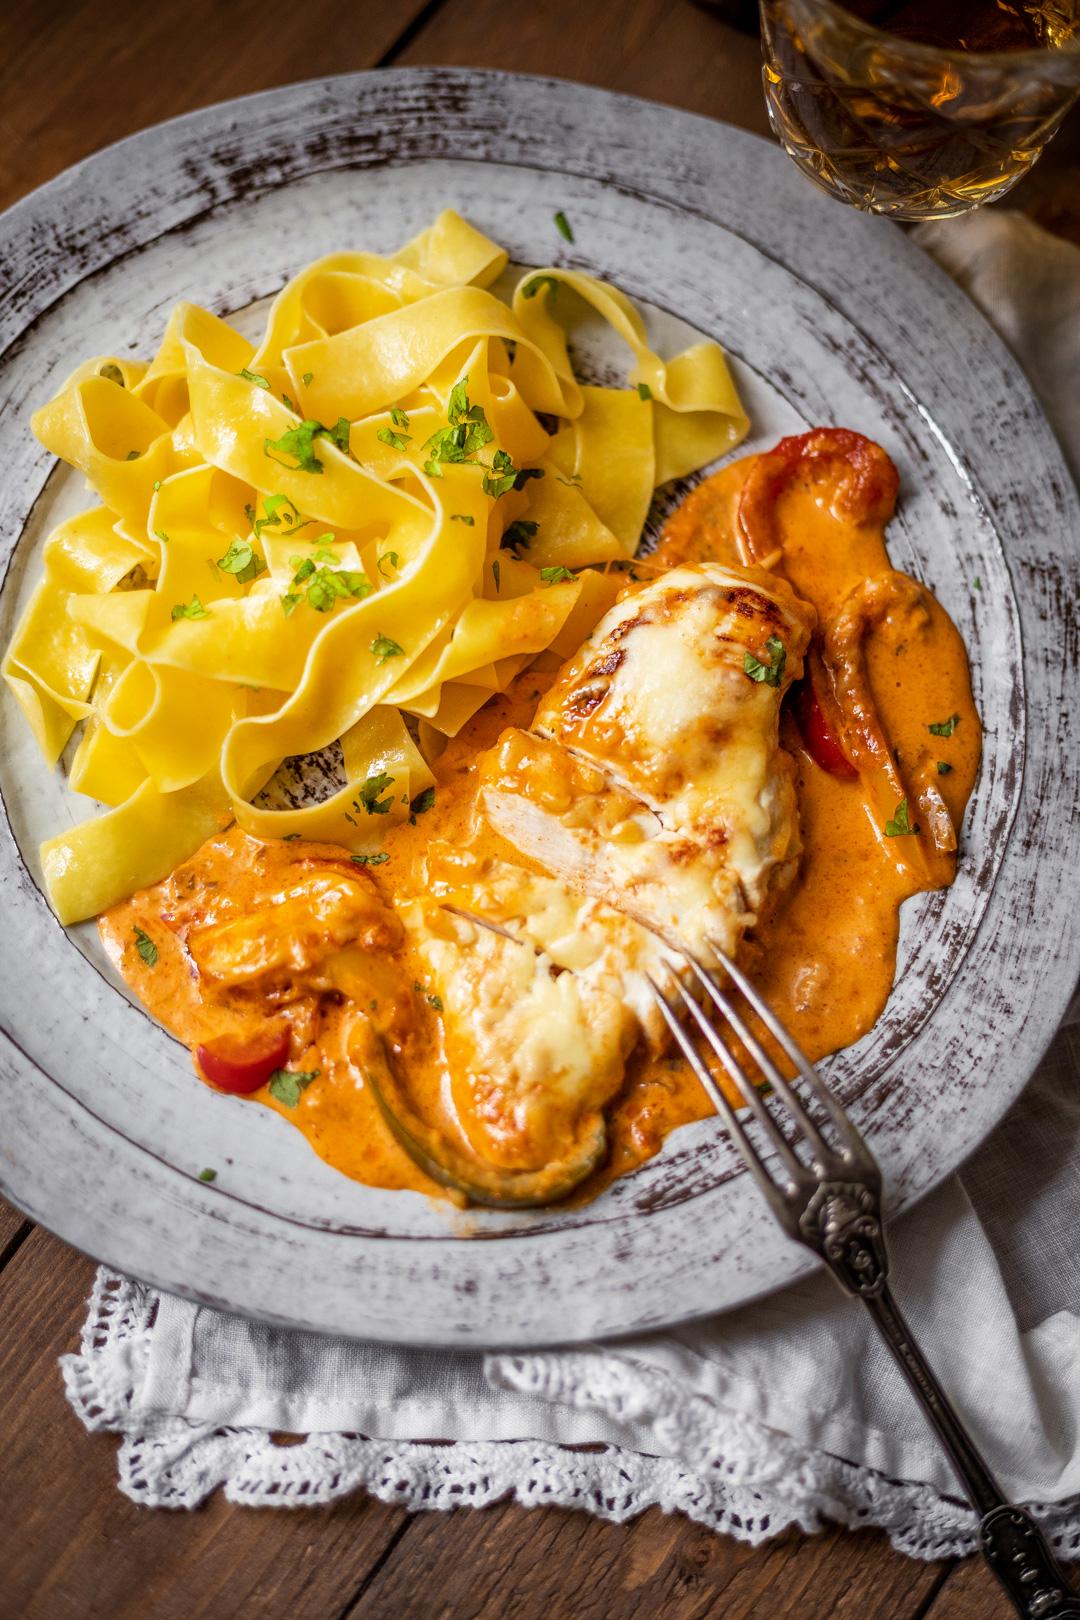 Paprika-Sahne-Hähnchen ohne Fix - Kochmädchen Foodblog